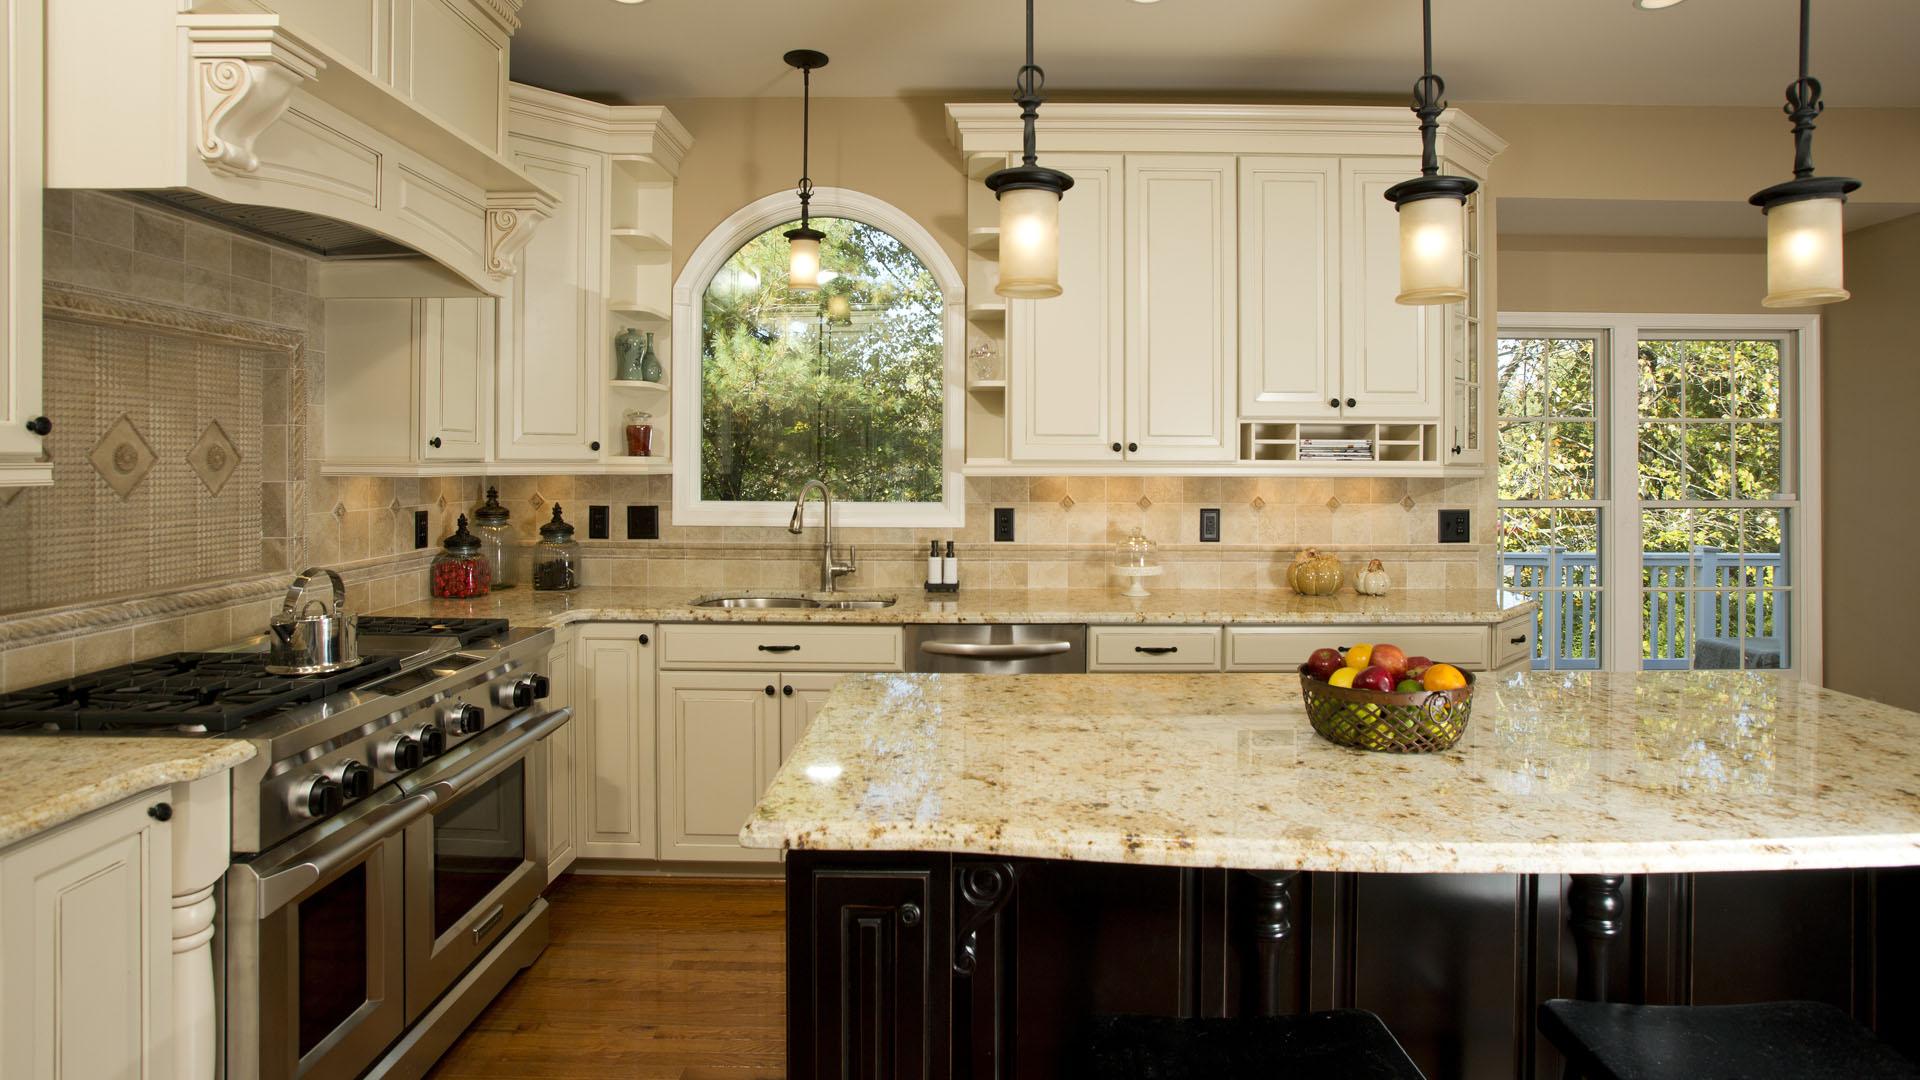 2015 NARI Capital CotY Grand Award Winner, Residential Kitchen $30,000 to $60,000